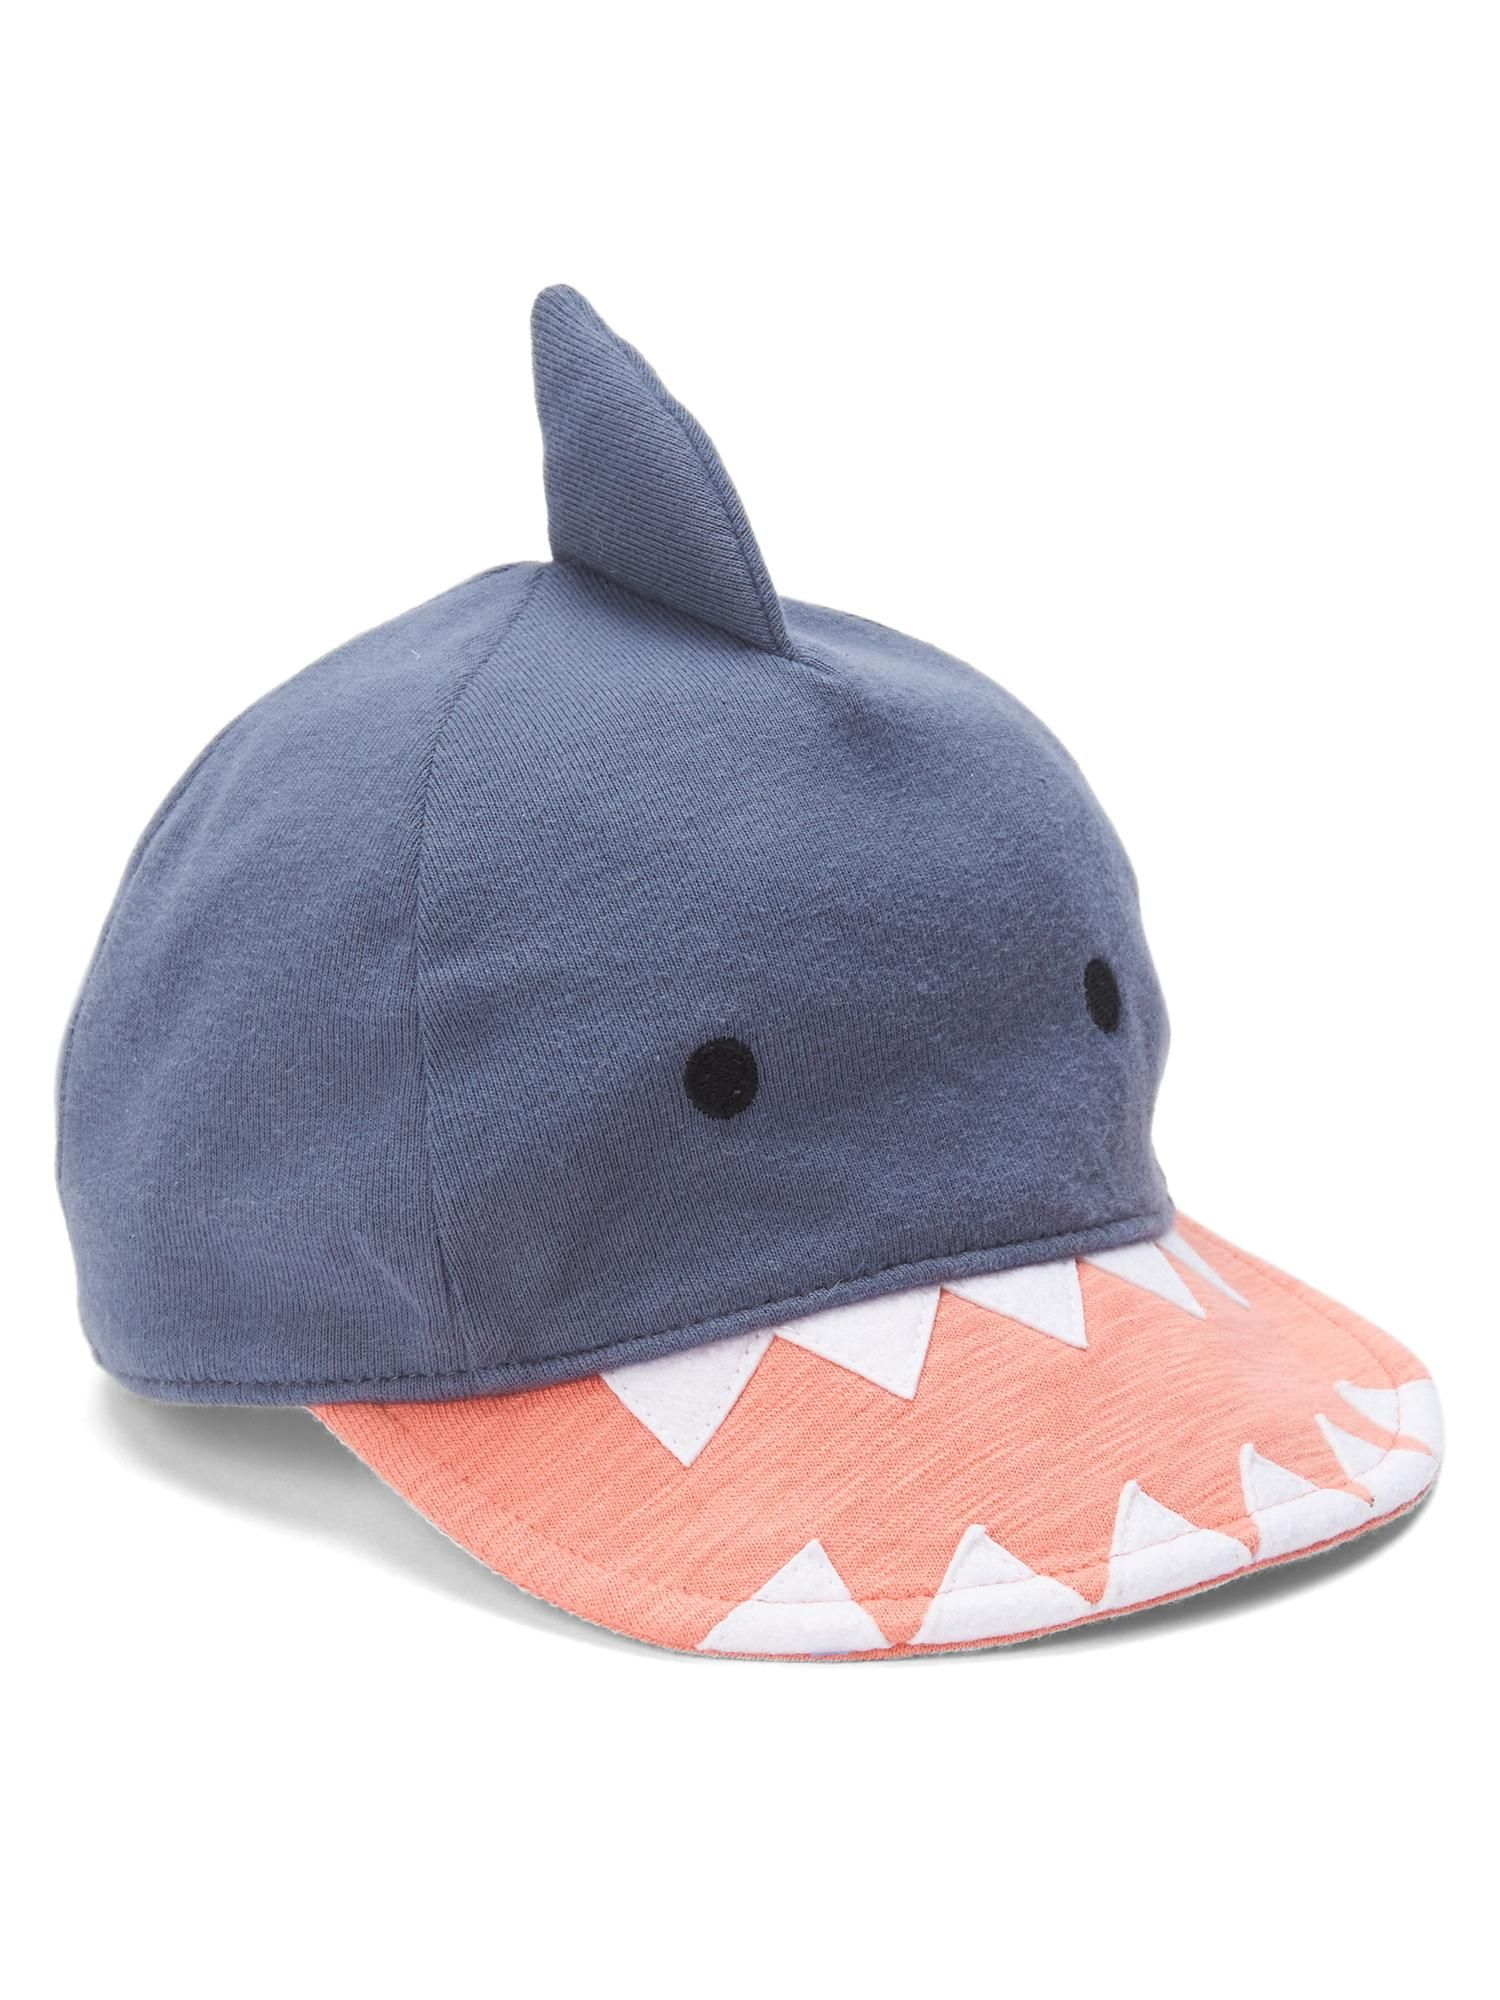 e946bfe43c7 Shark baseball hat